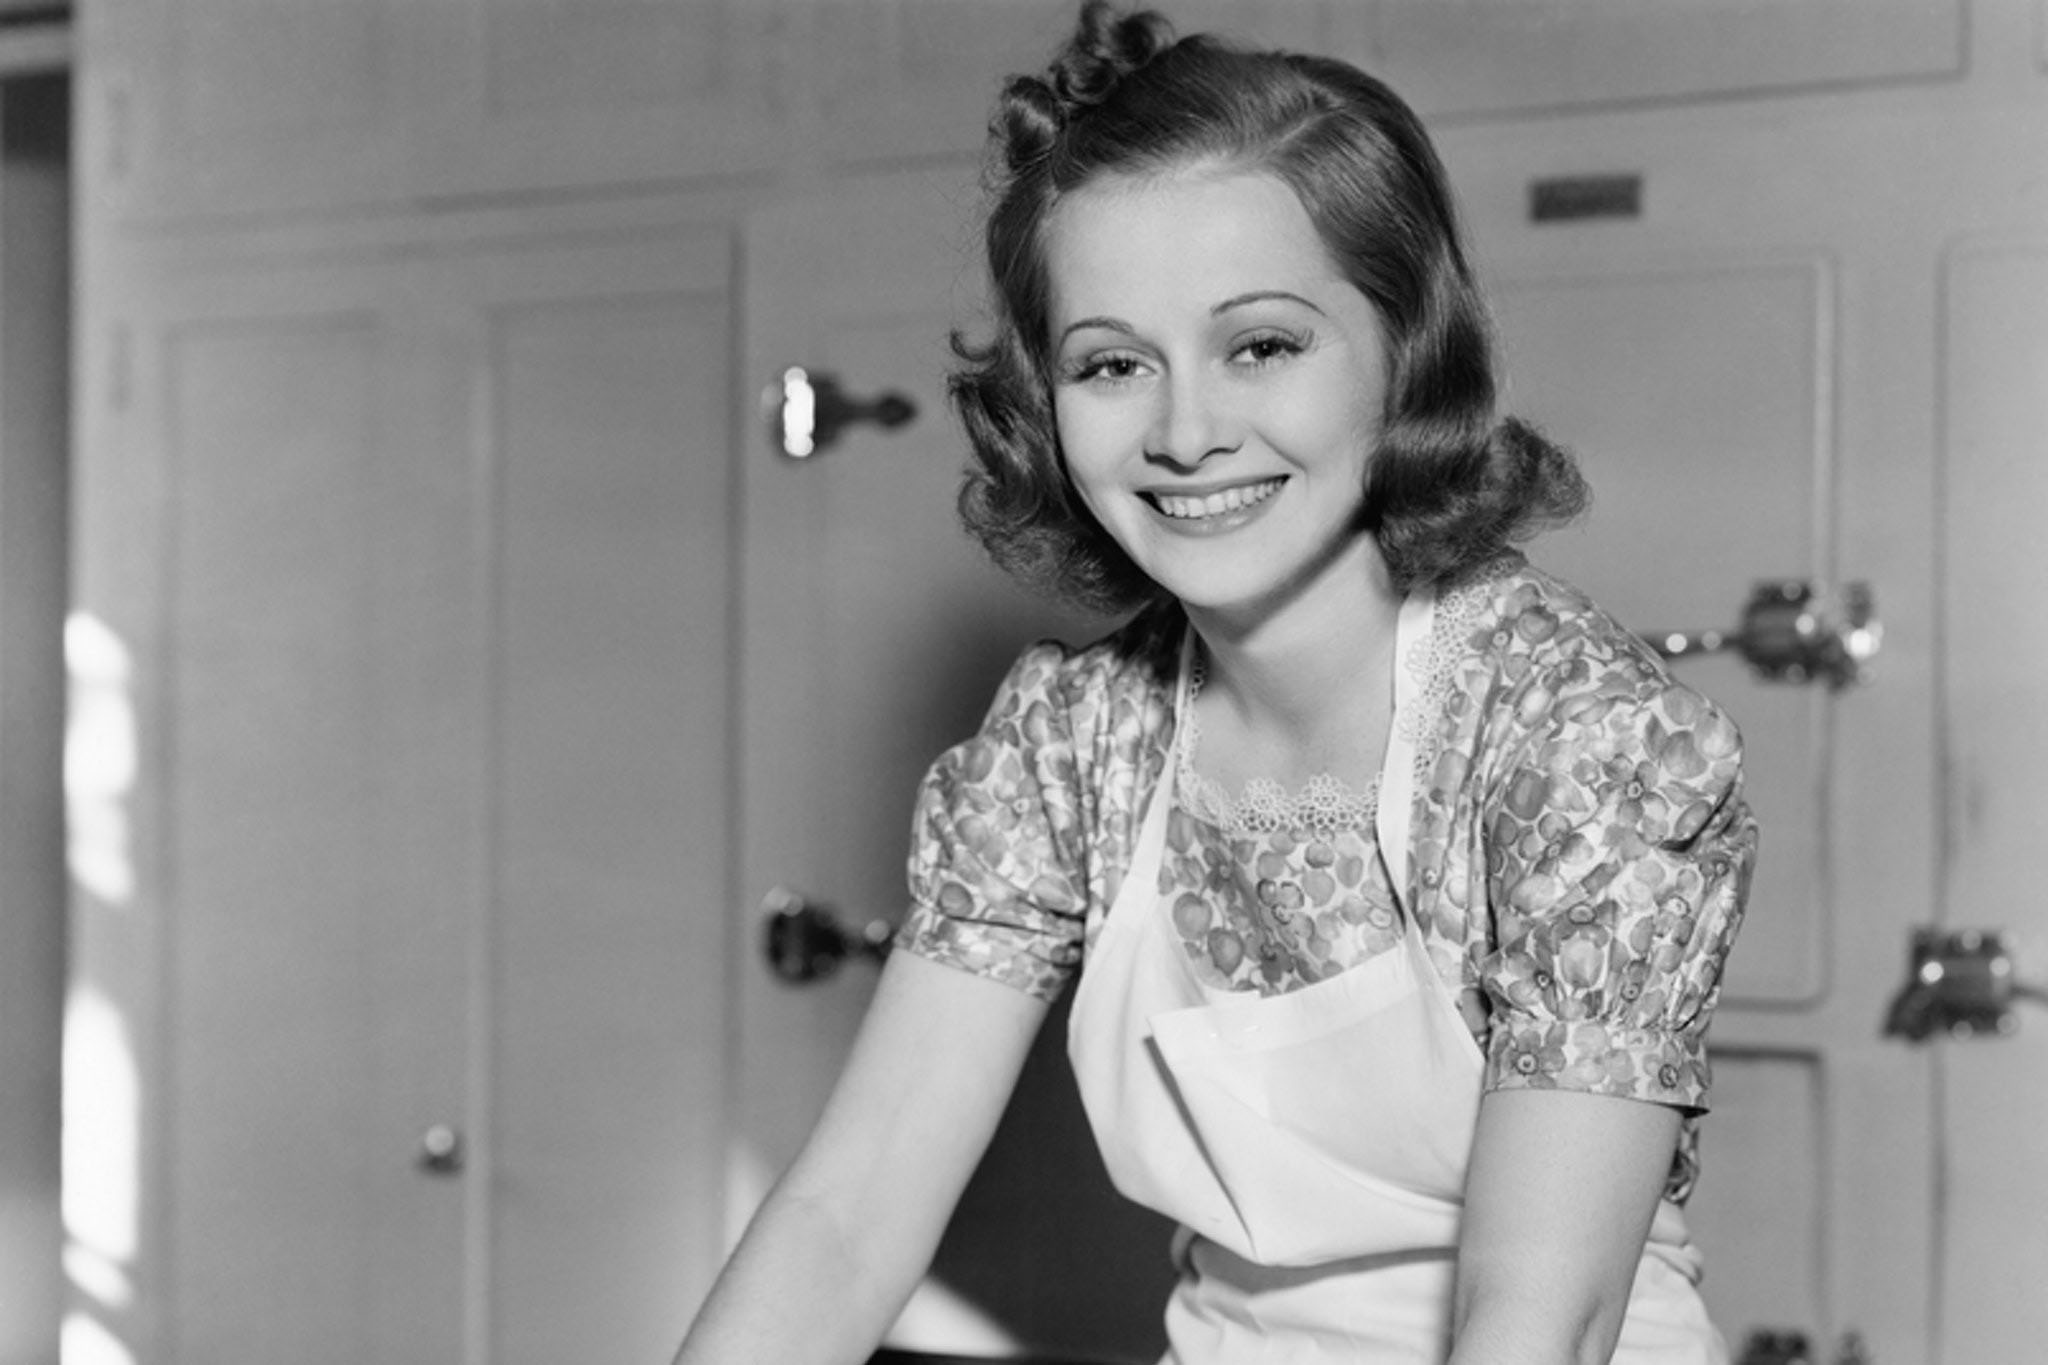 Ketty Thull: Luxembourg's Betty Crocker